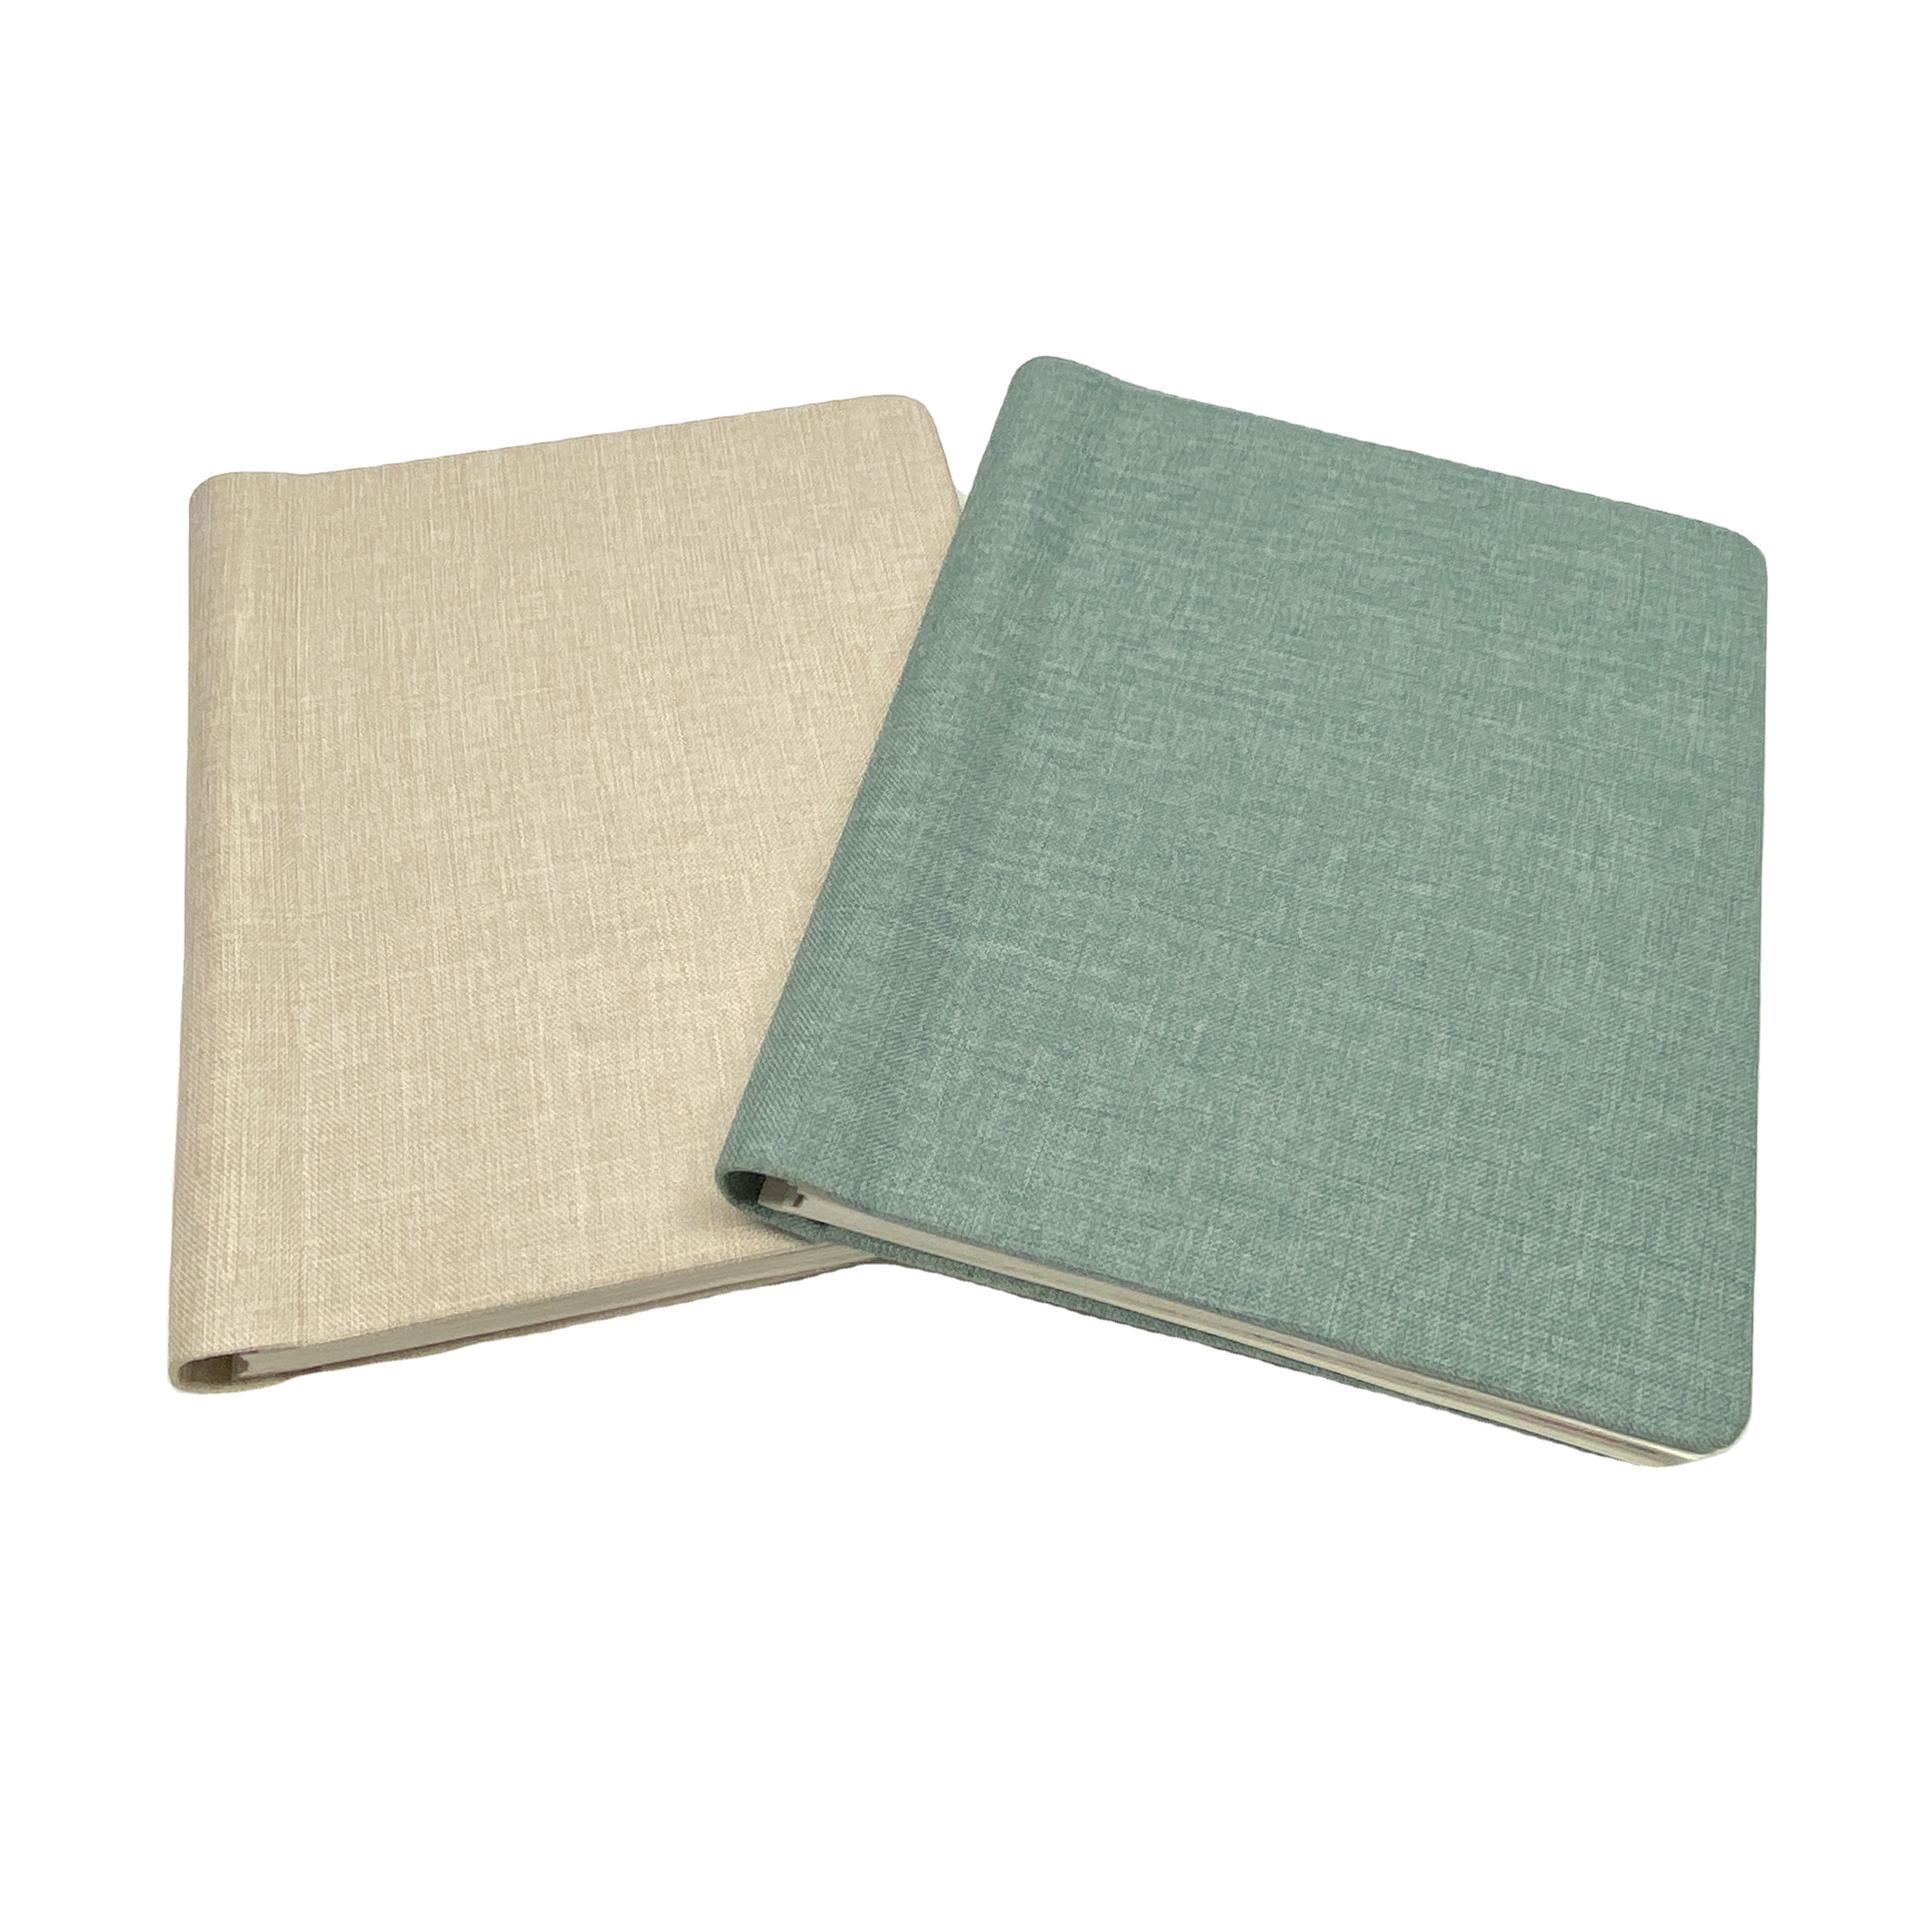 Custom Spiral Budget Weekly Pray Planner Customized Planner Spiral Notebook